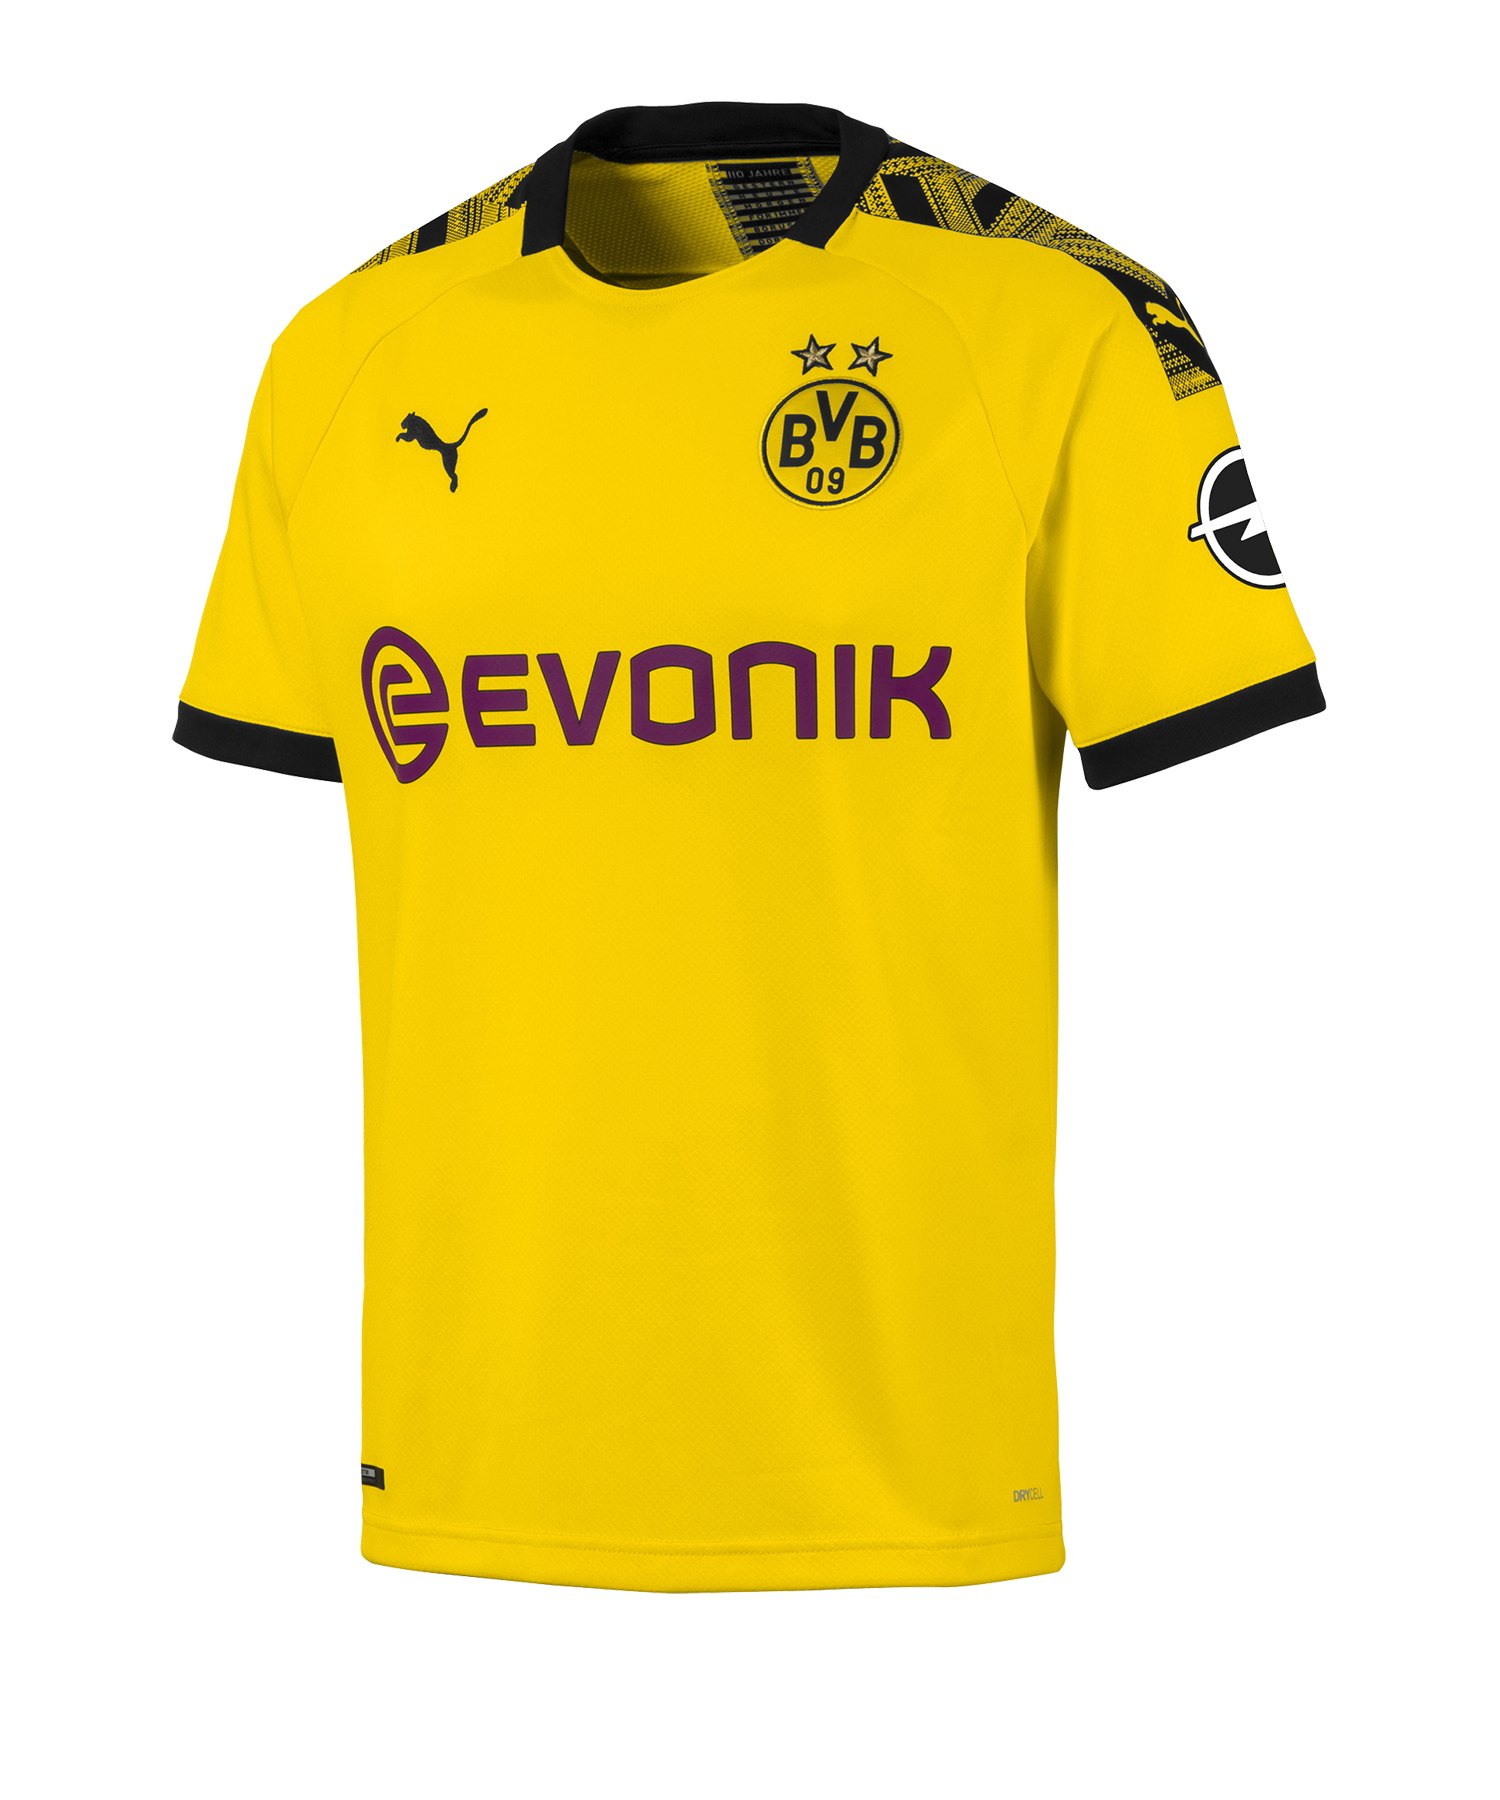 PUMA BVB Dortmund Trikot Home 2019/2020 Gelb F01 - Gelb